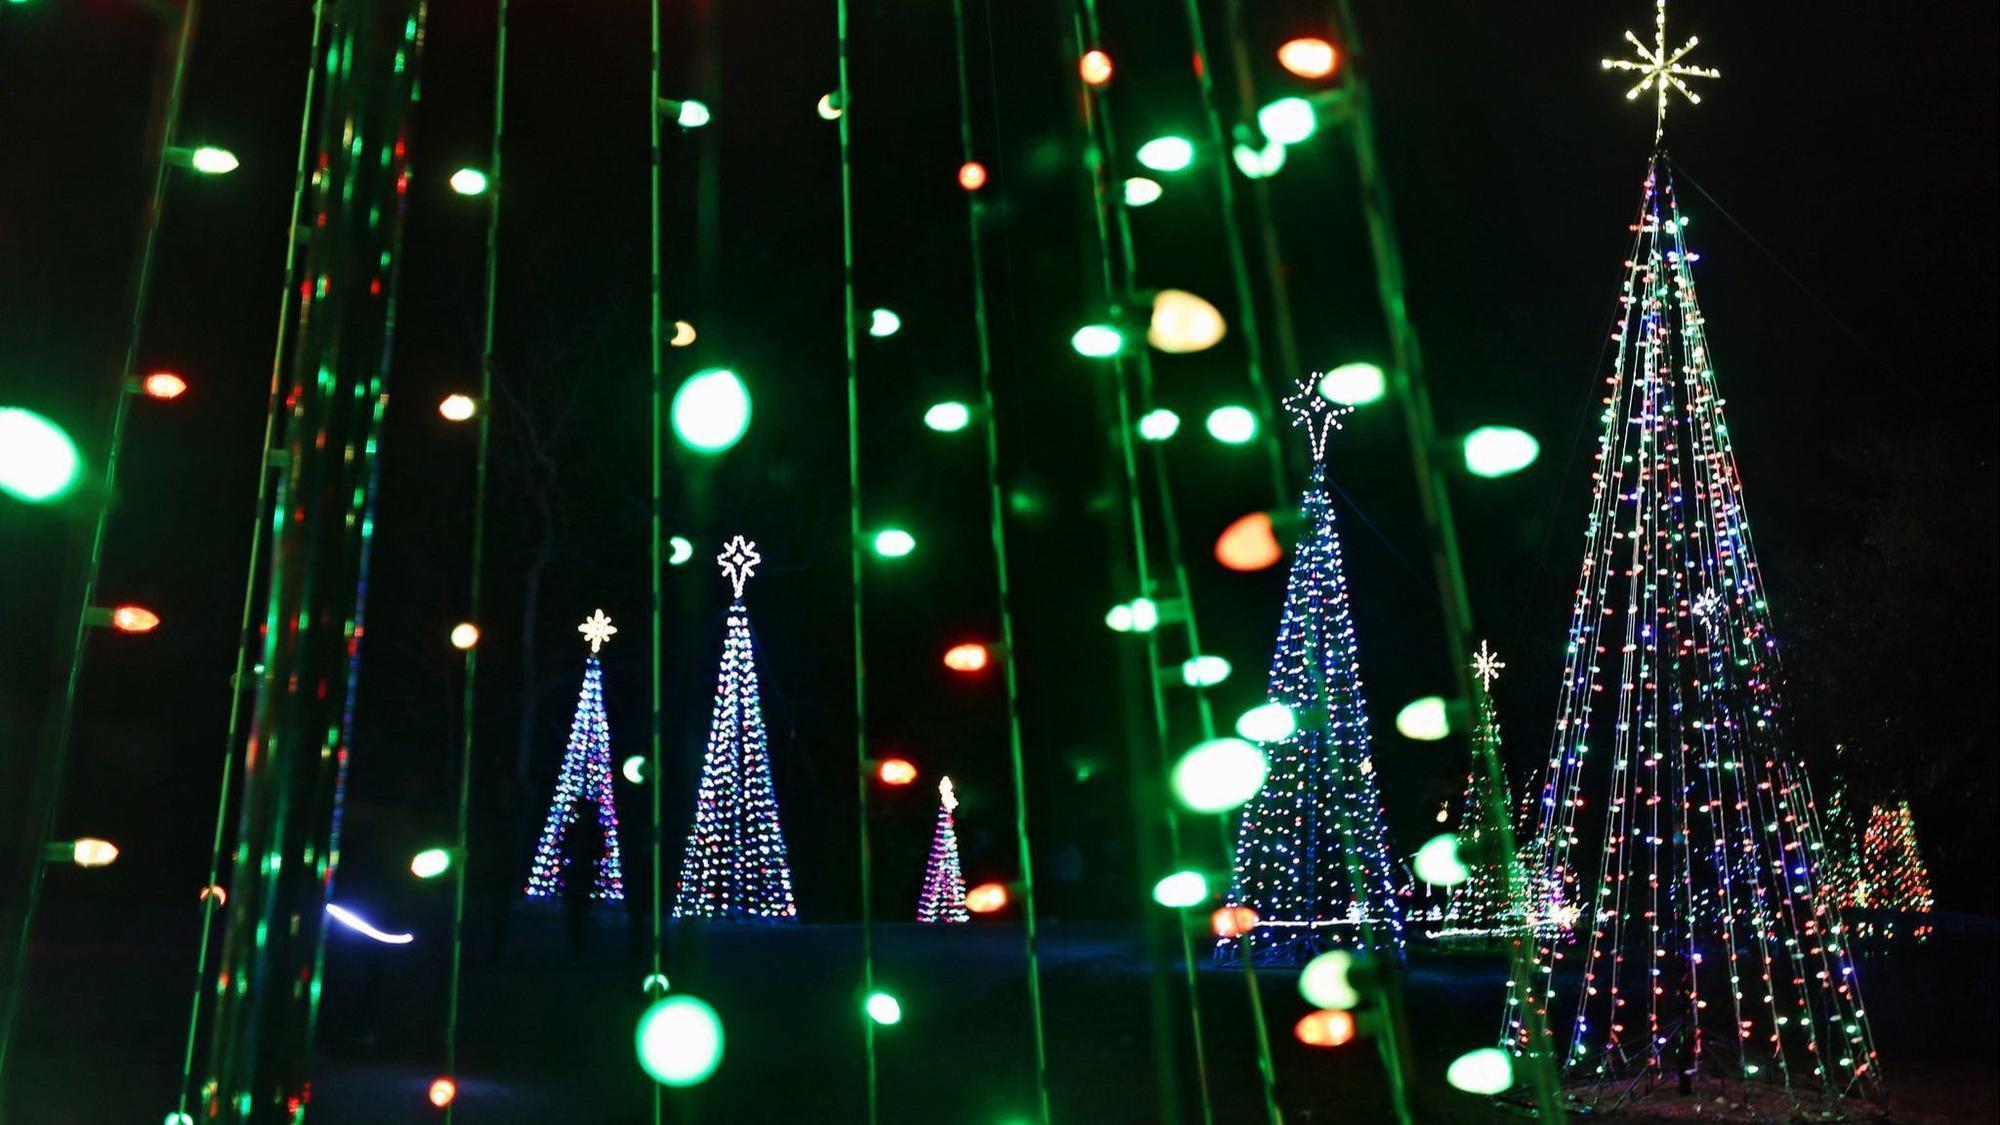 Holiday lights brighten the season - Williamsburg Magazine